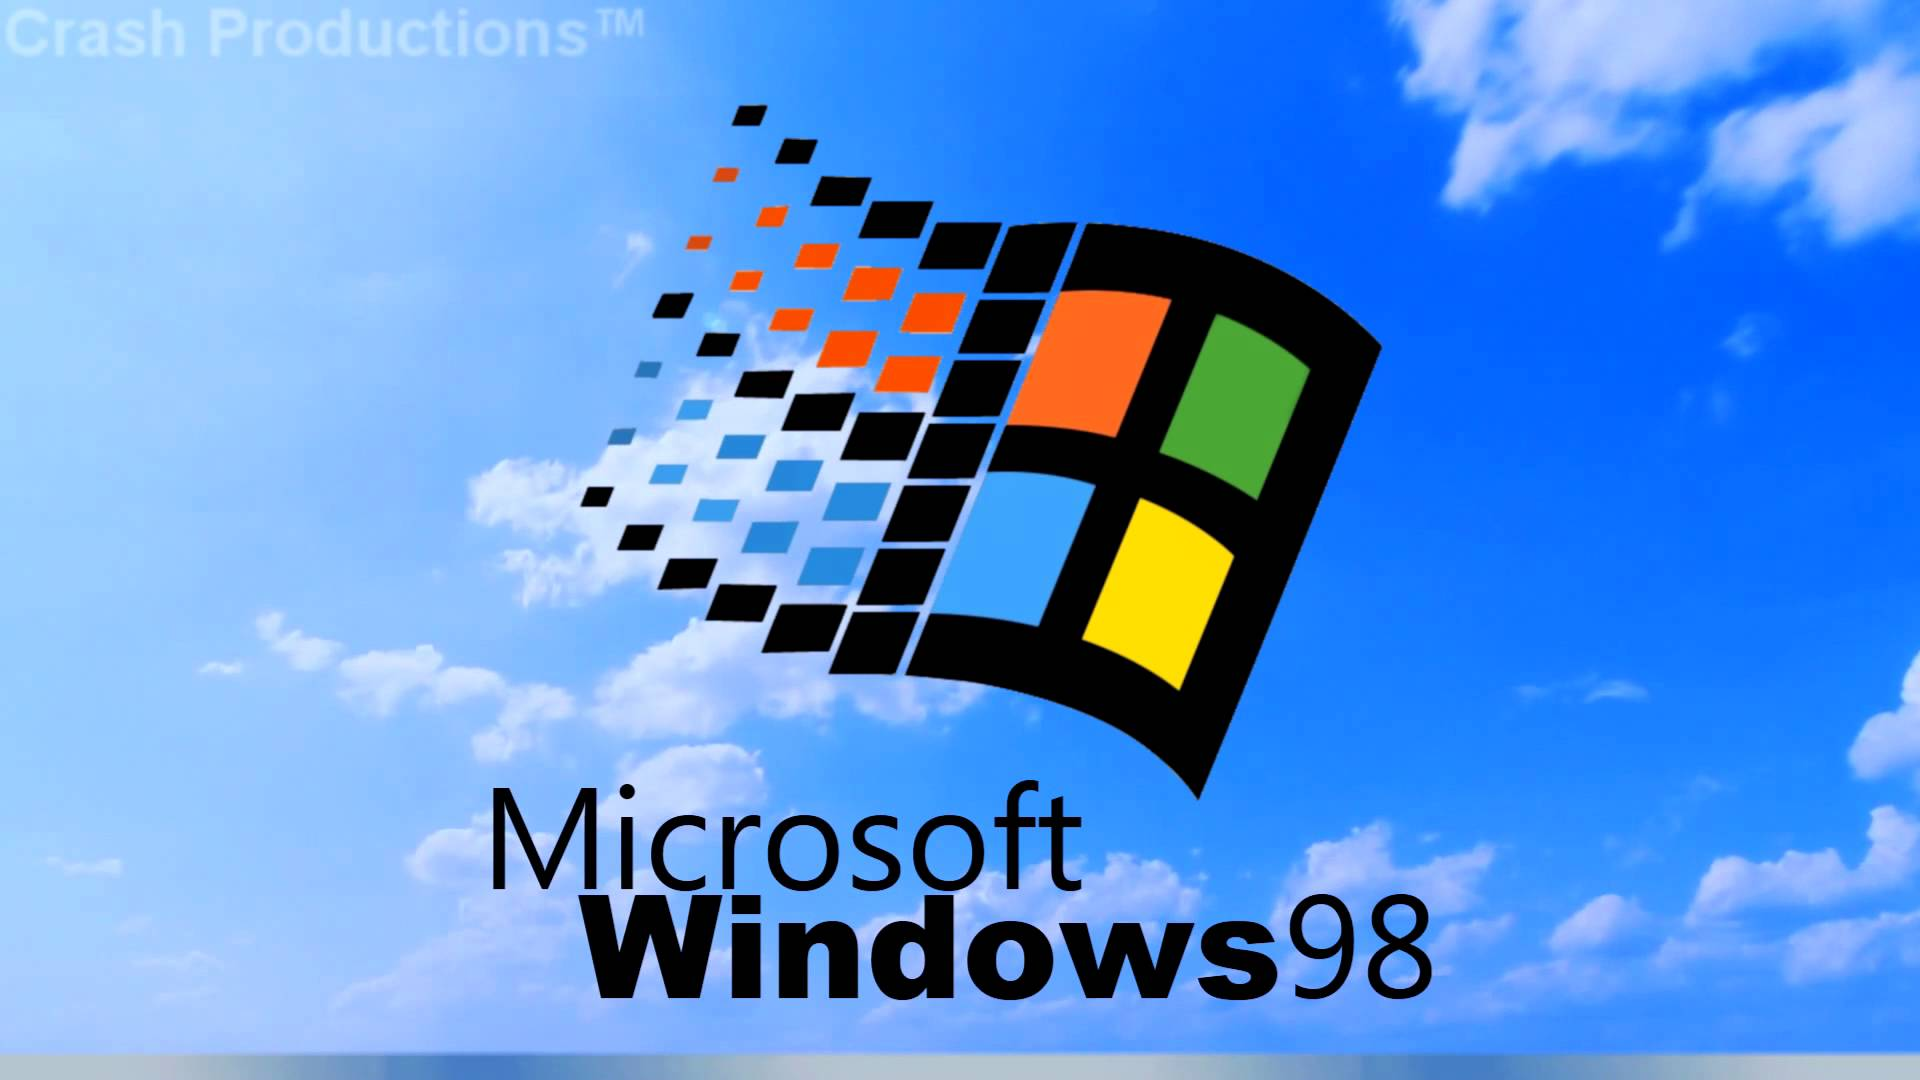 49+] Windows 98 Wallpapers on WallpaperSafari